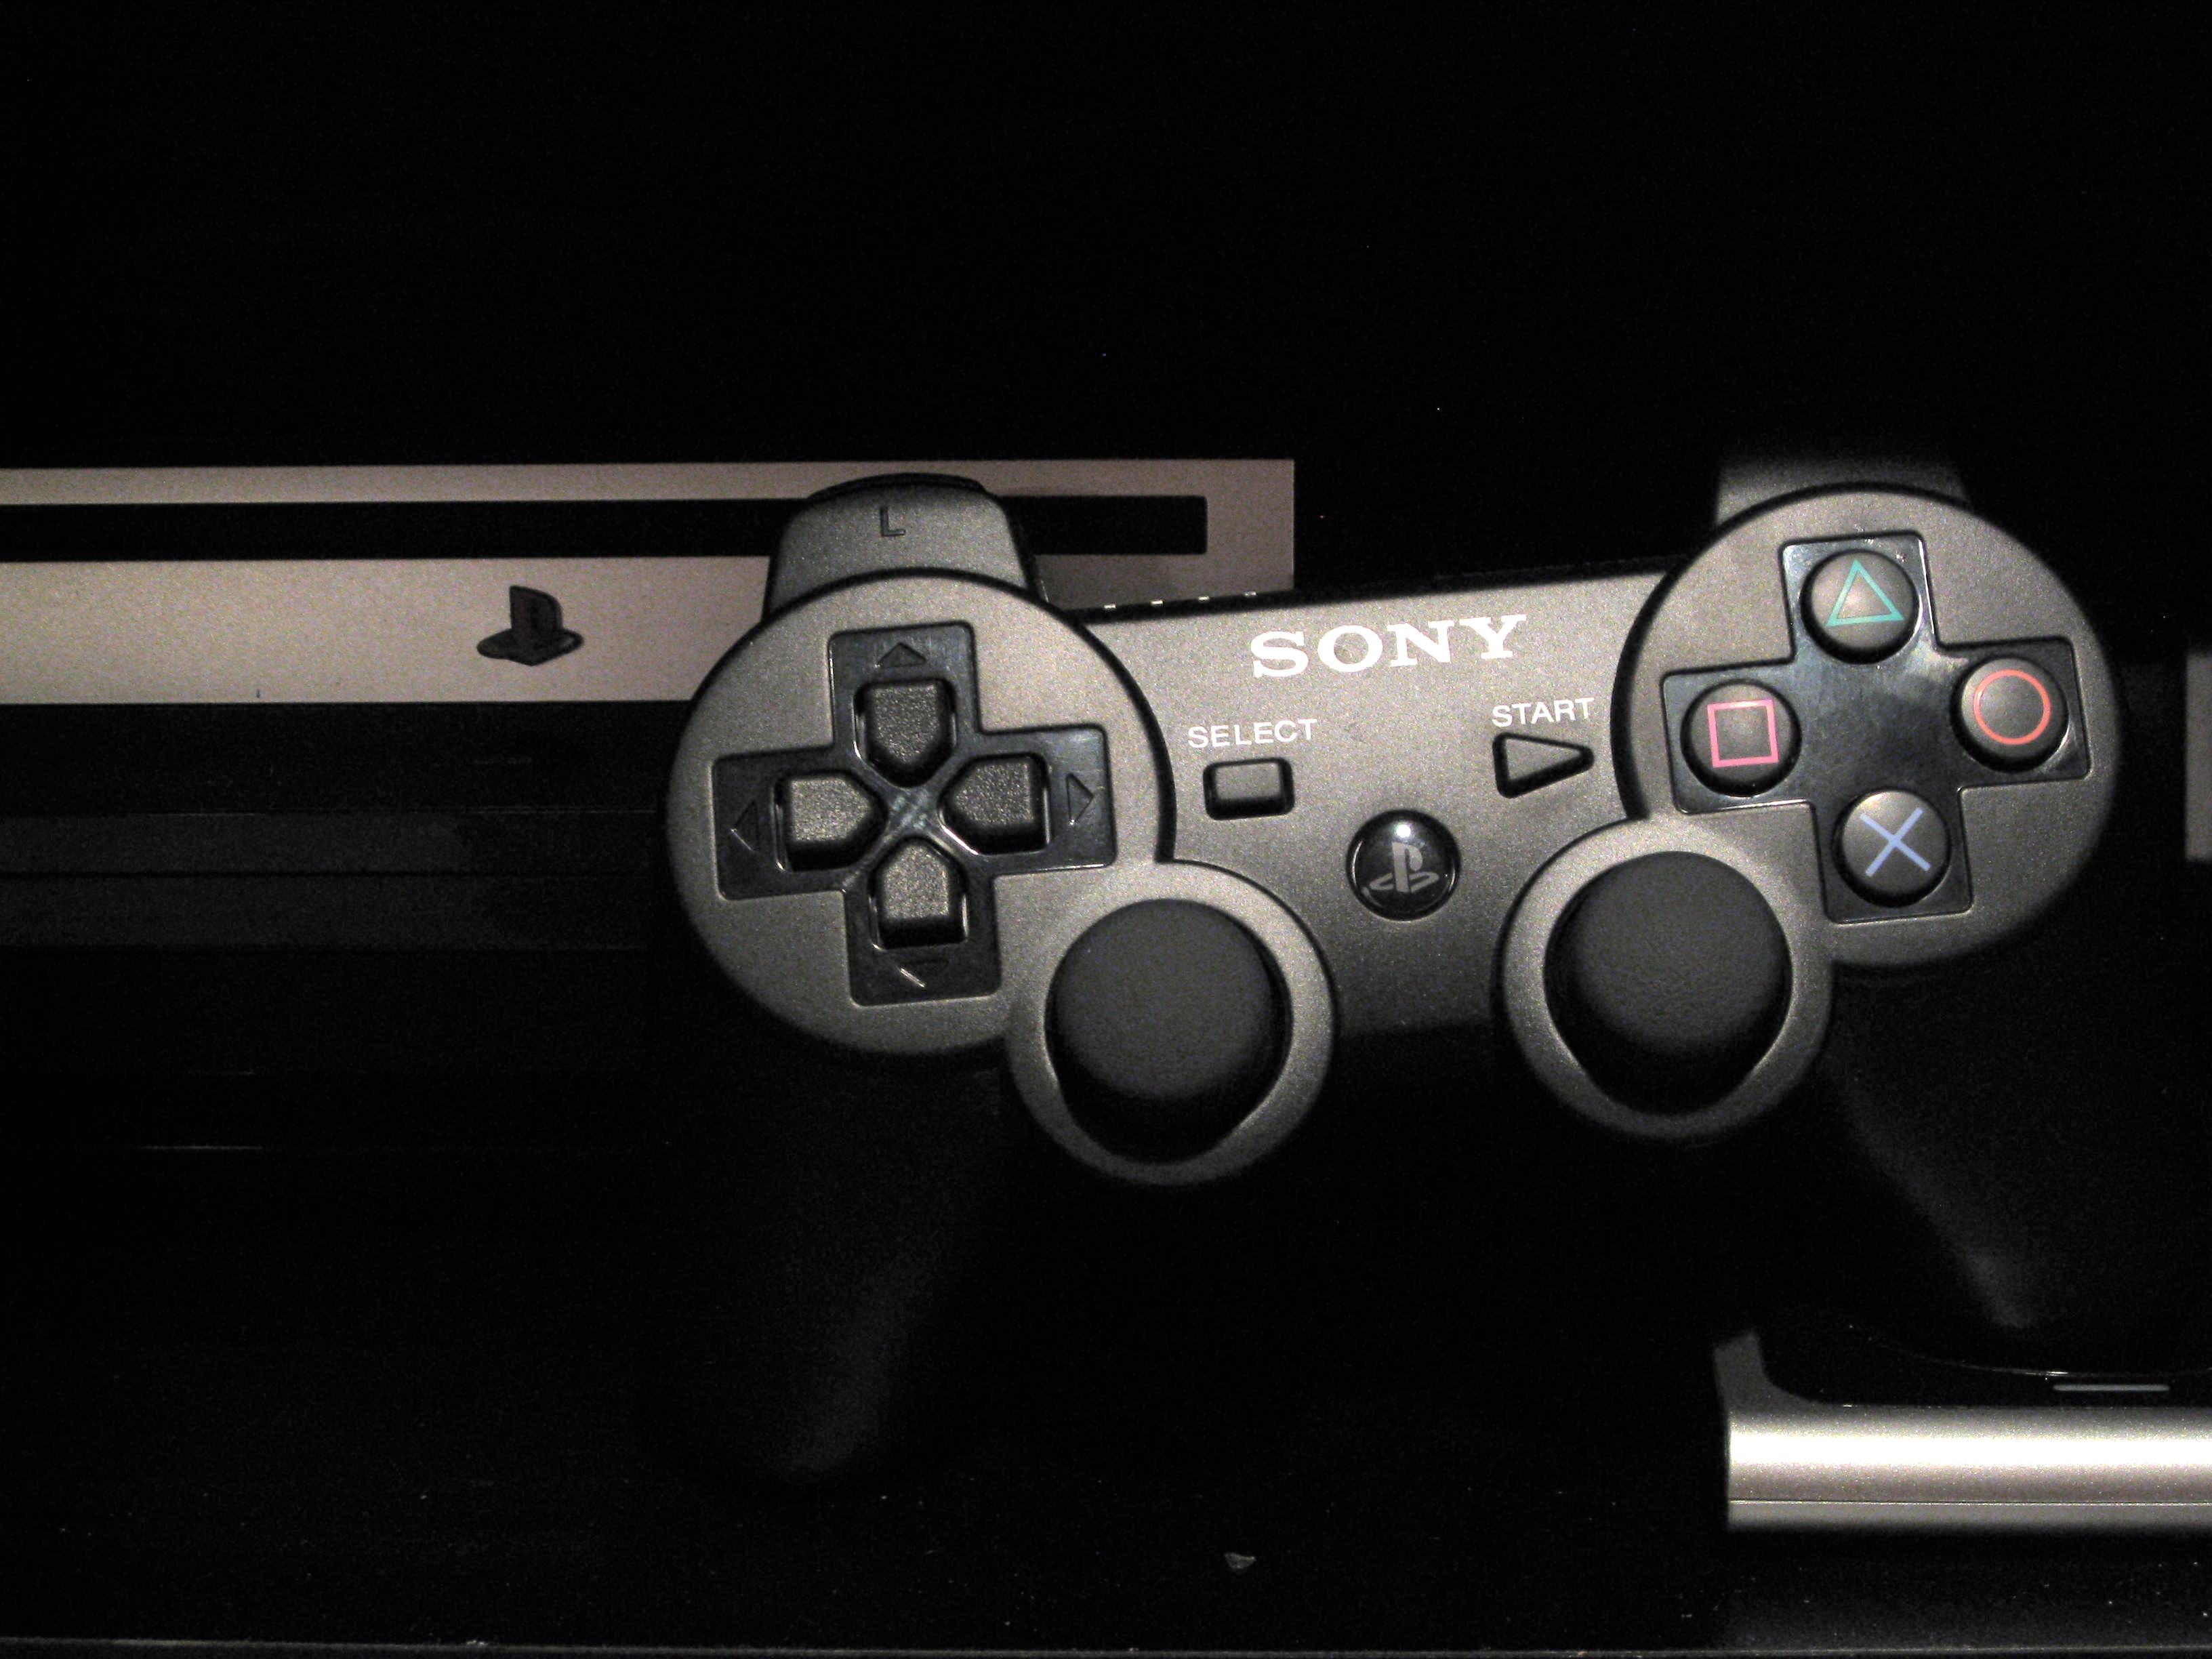 img_3105.jpg - Sony Playstation